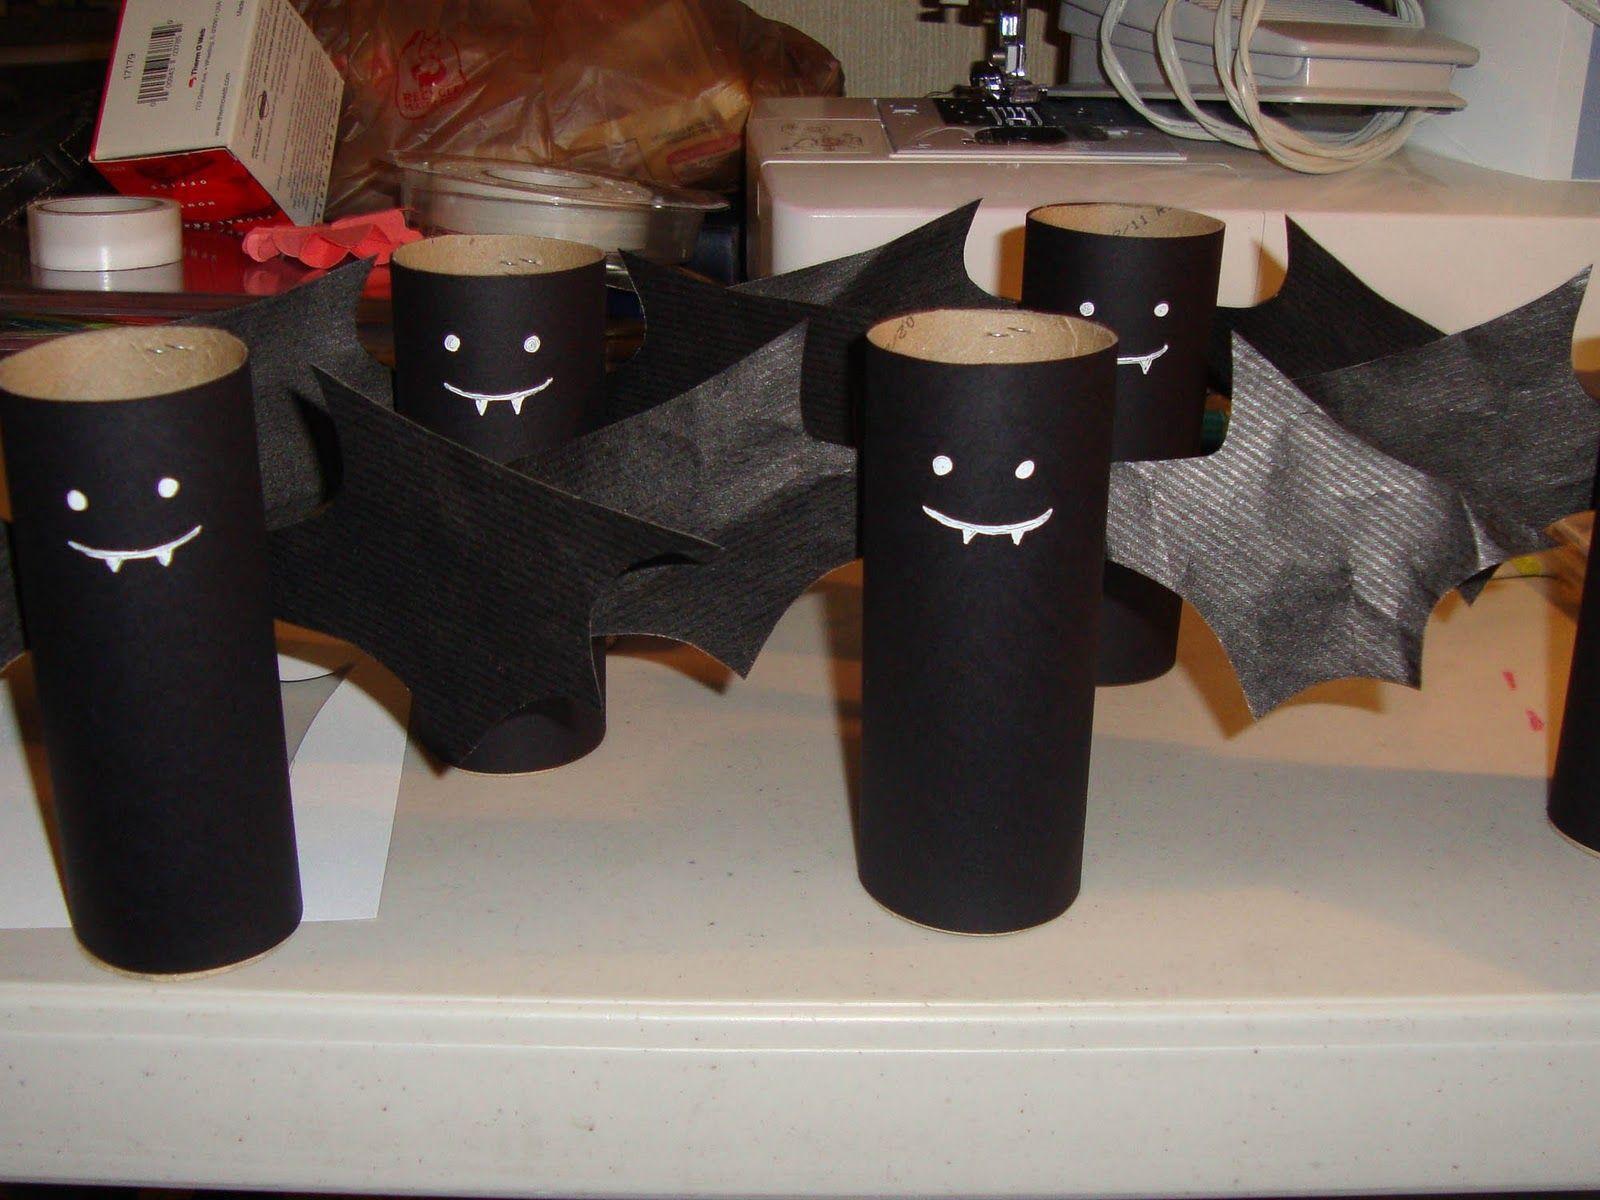 I M Batty Candy Party Favors Halloween Crafts Paper Bat